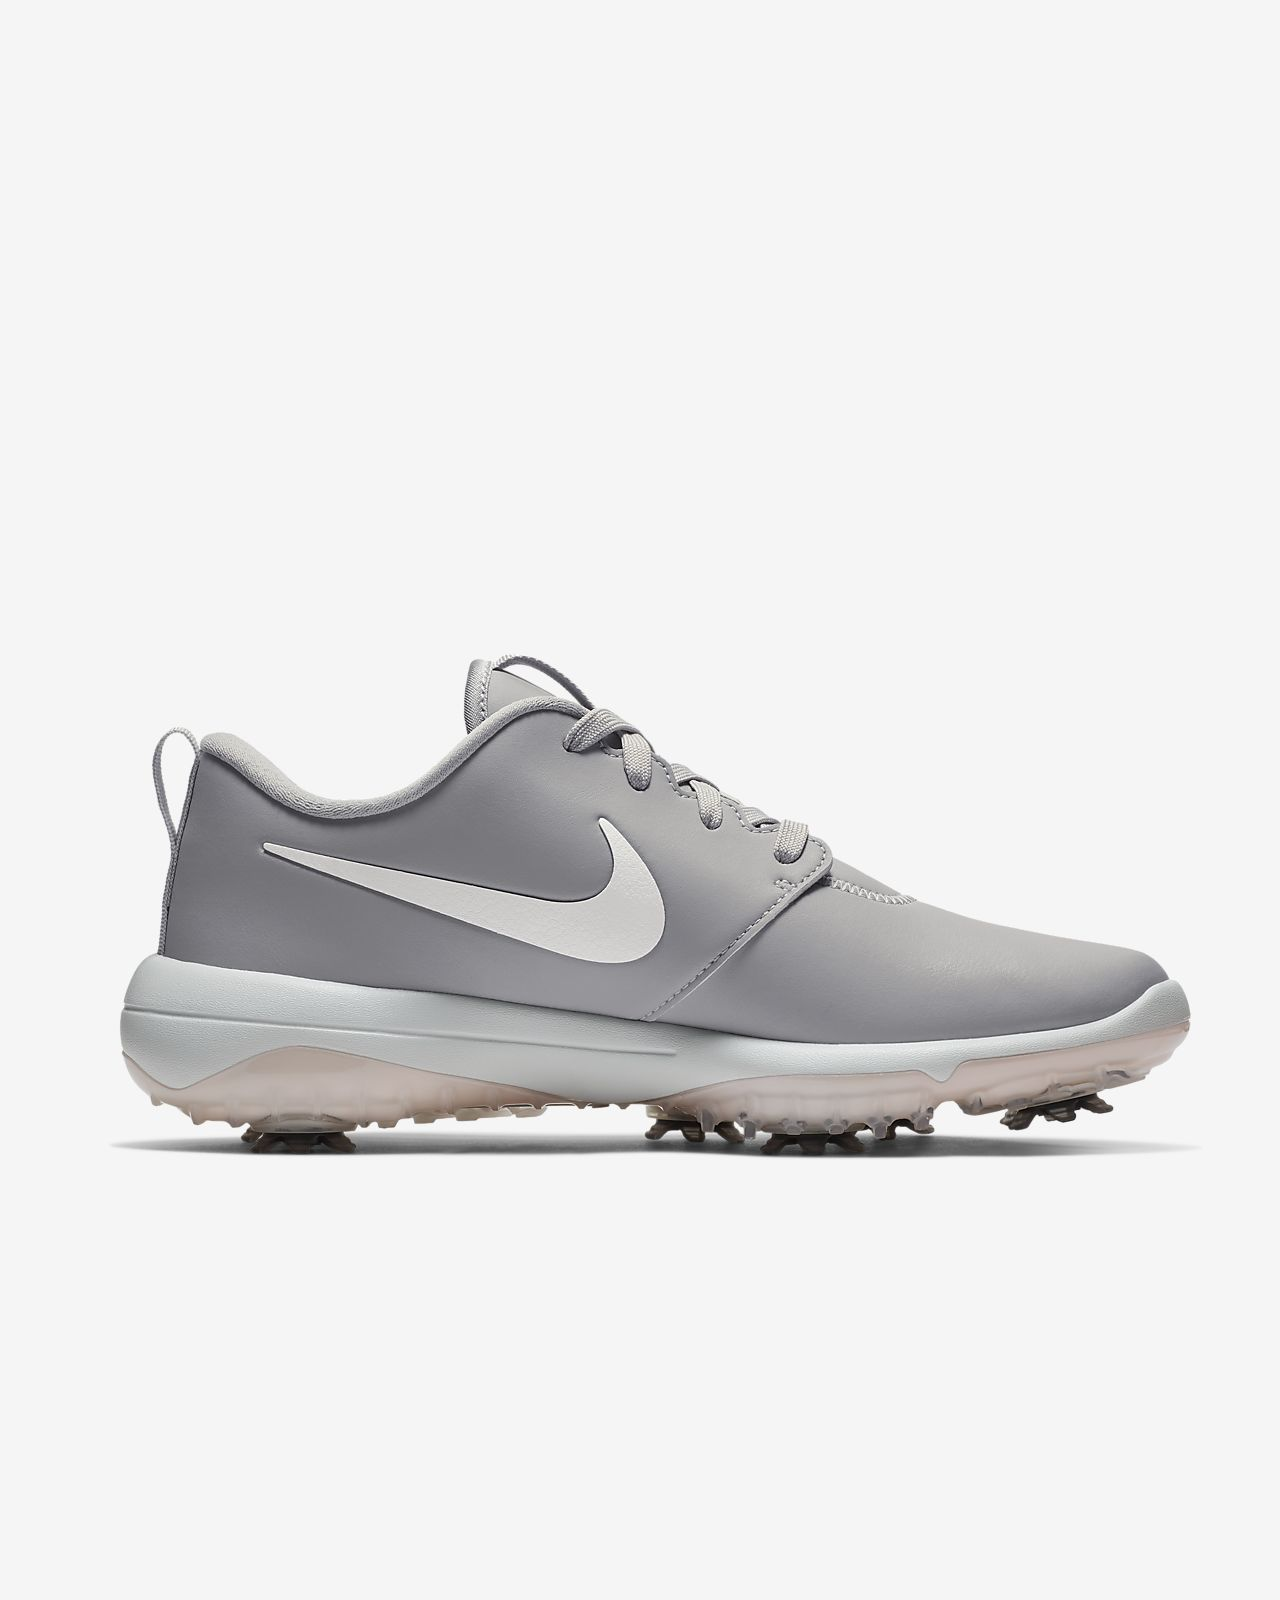 new style dea5f 92a51 Chaussure de golf Nike Roshe G Tour pour Femme. Nike.com CA